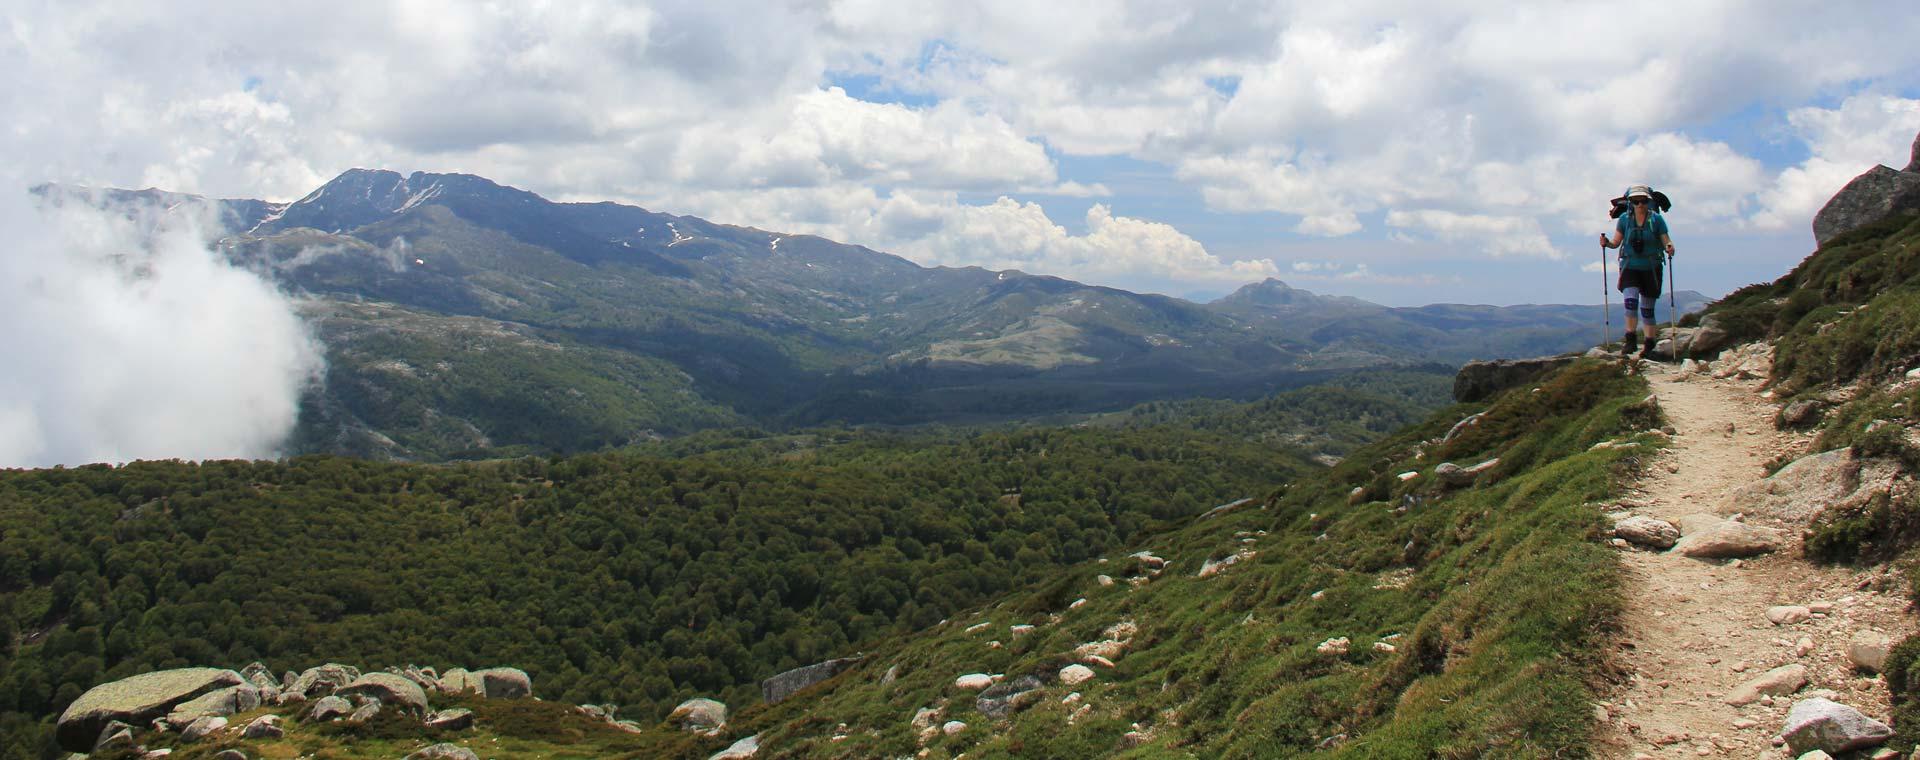 Image Corse : le GR20 Sud